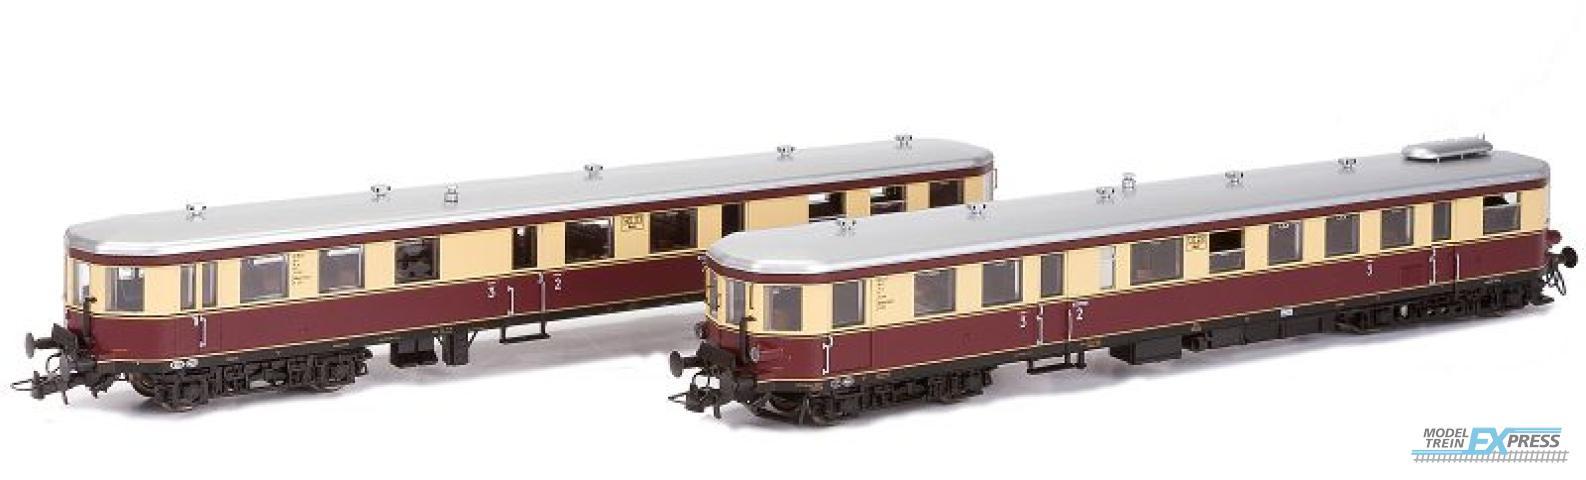 Hobbytrain 303600